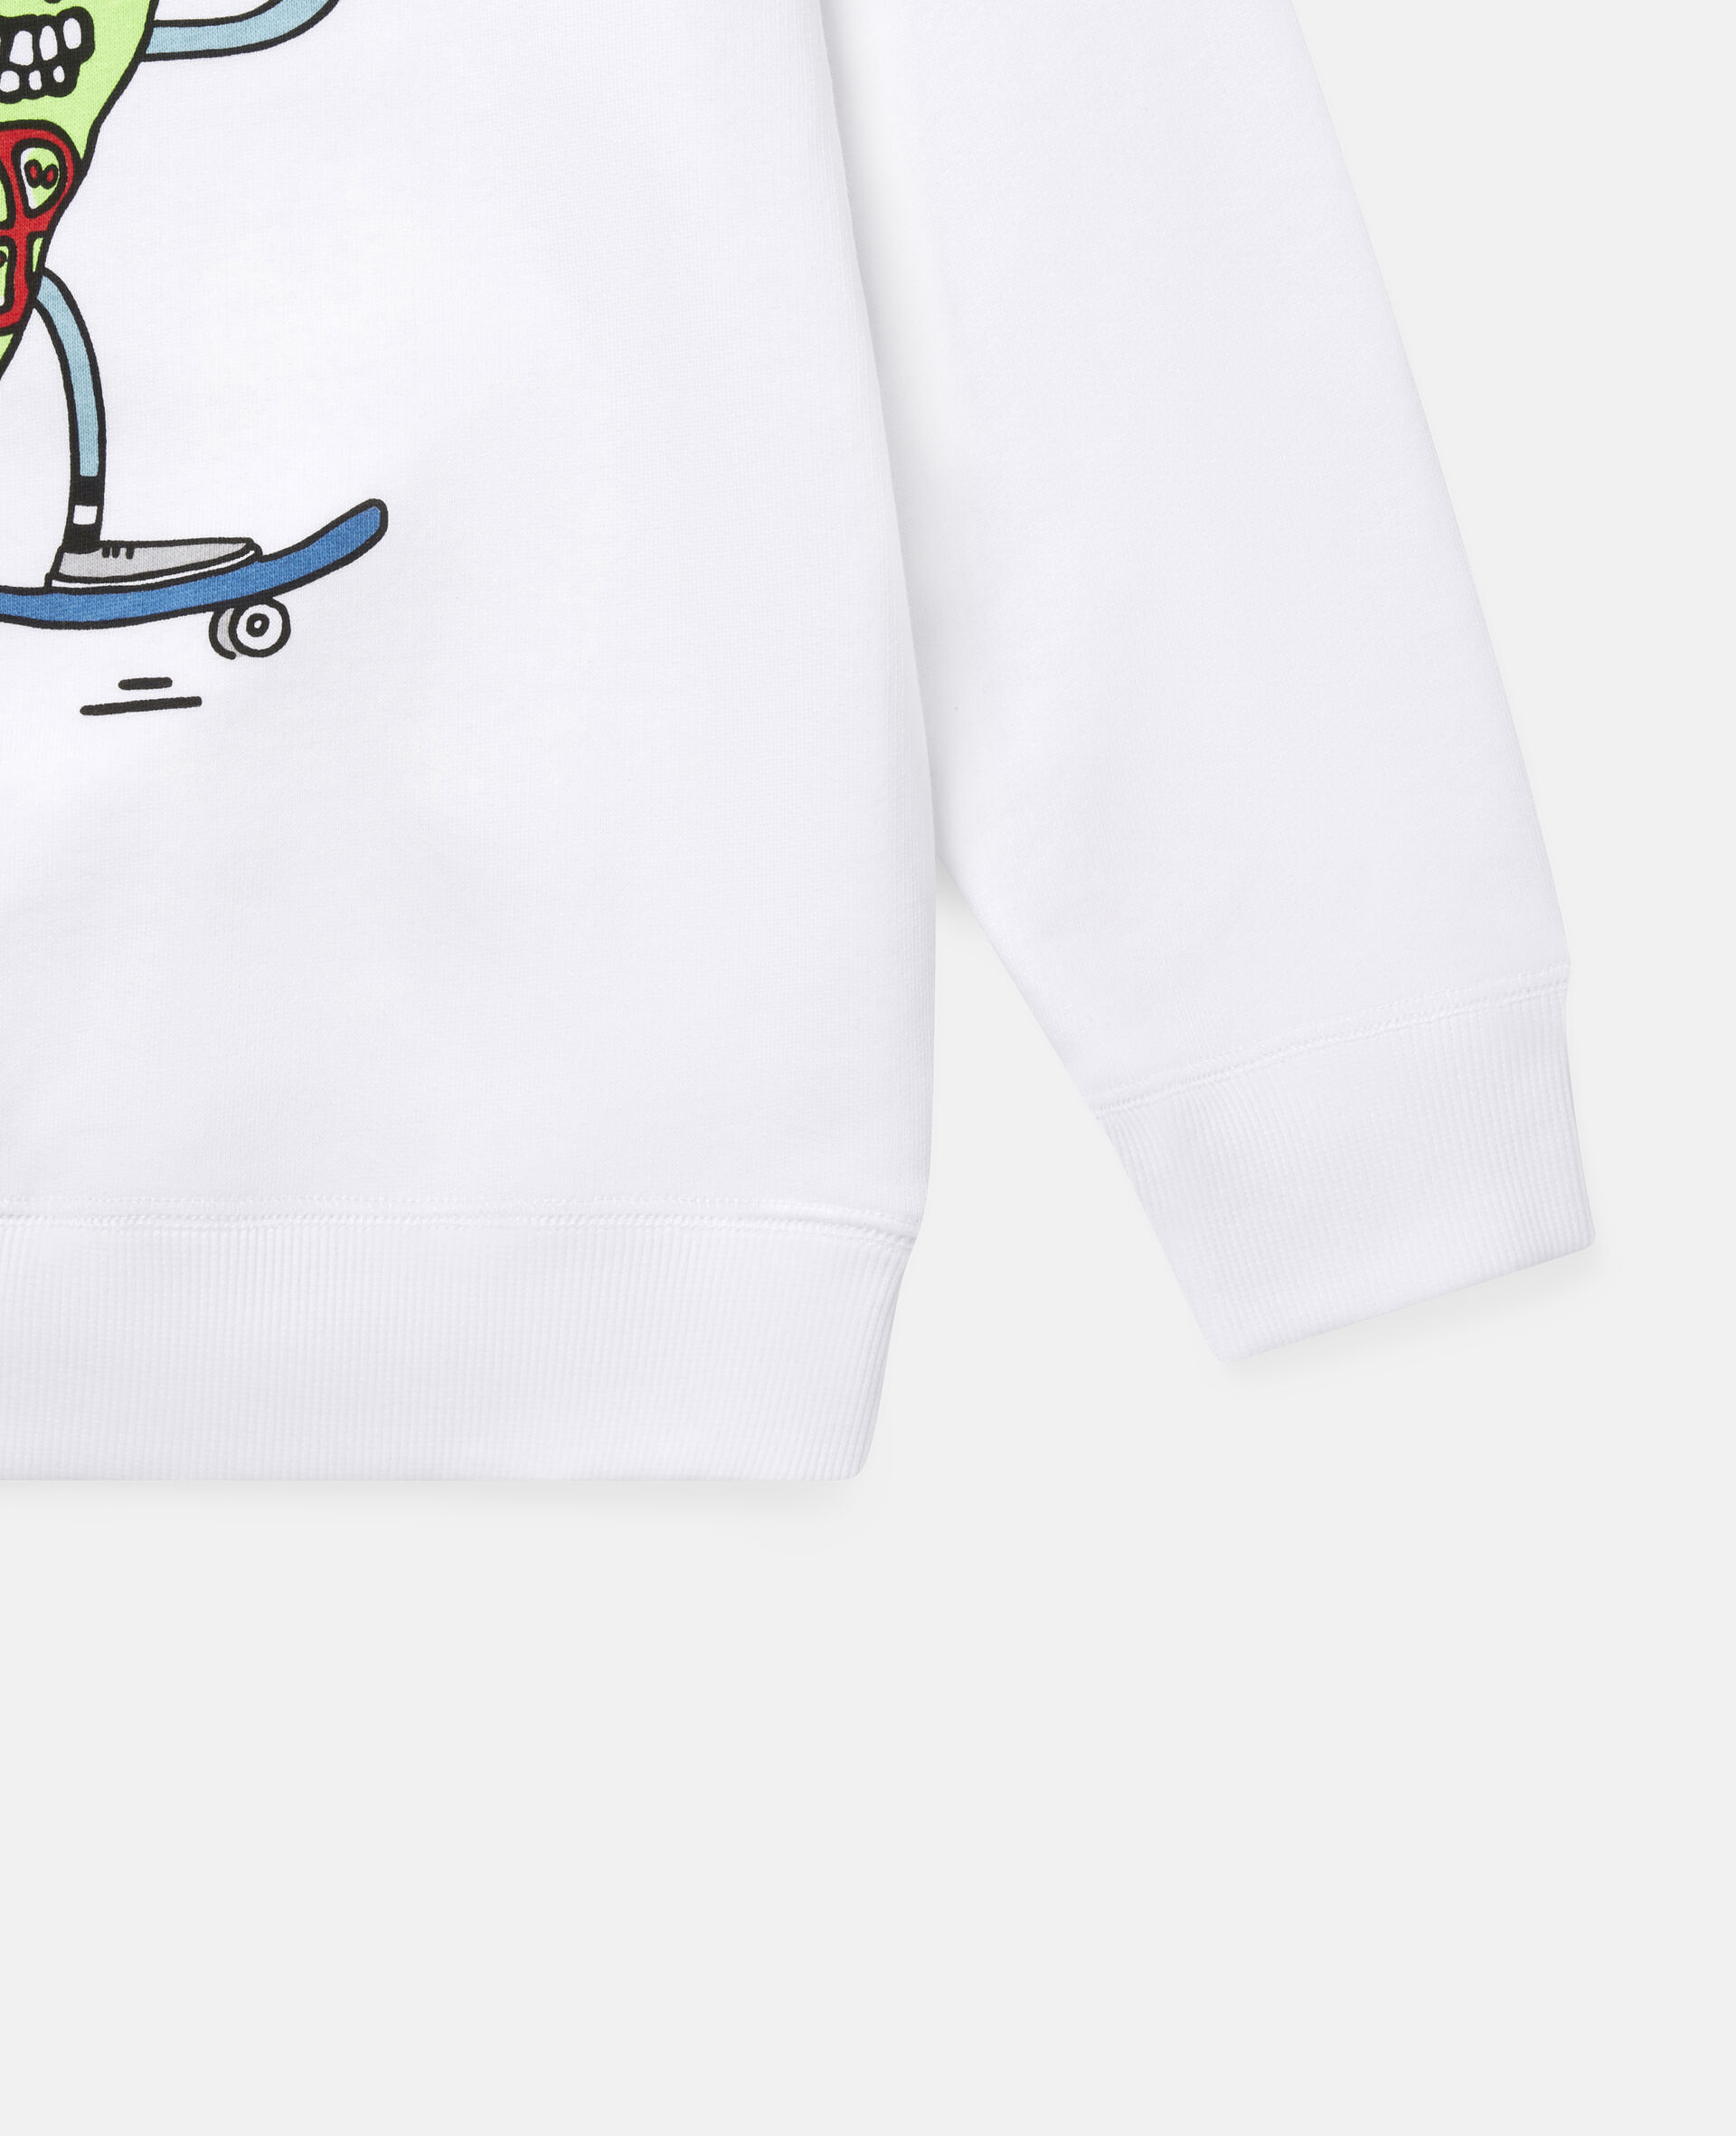 Fleece-Sweatshirt mit Pizza-Skater-Motiv-Weiß-large image number 2